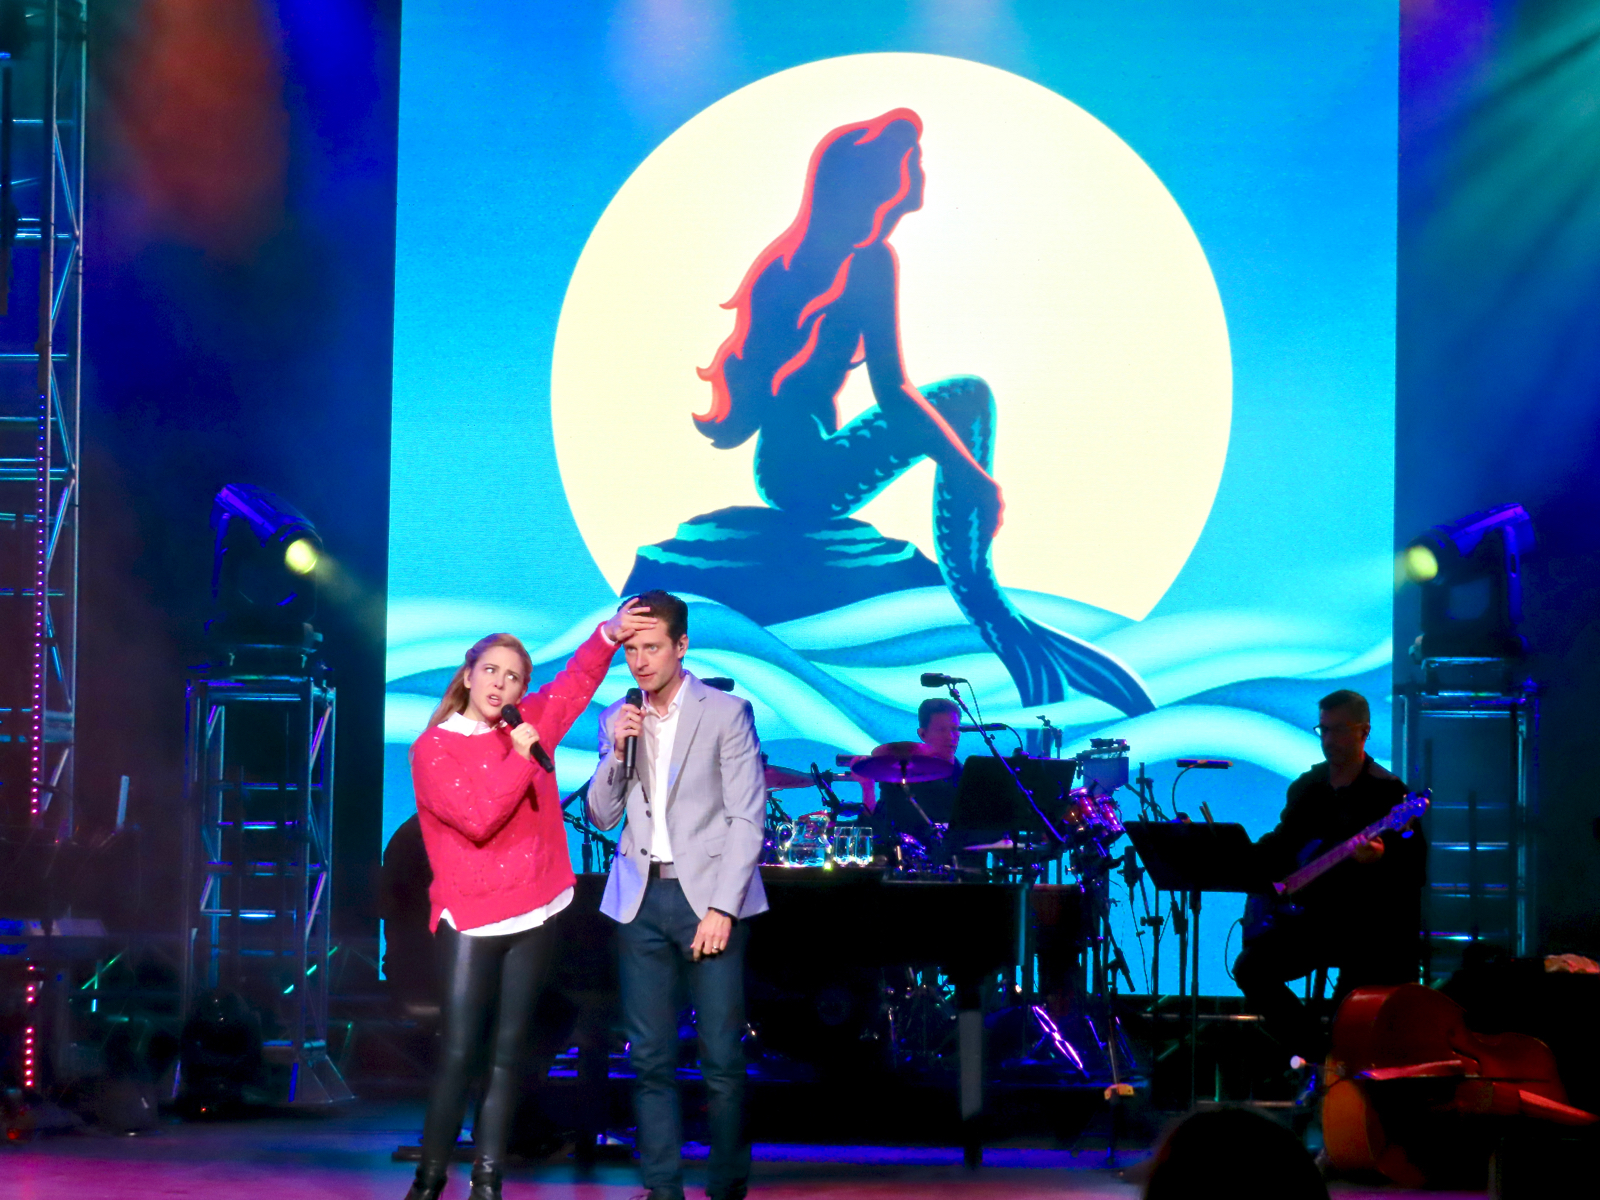 Mouseplanet - Walt Disney World Resort Update for January 29